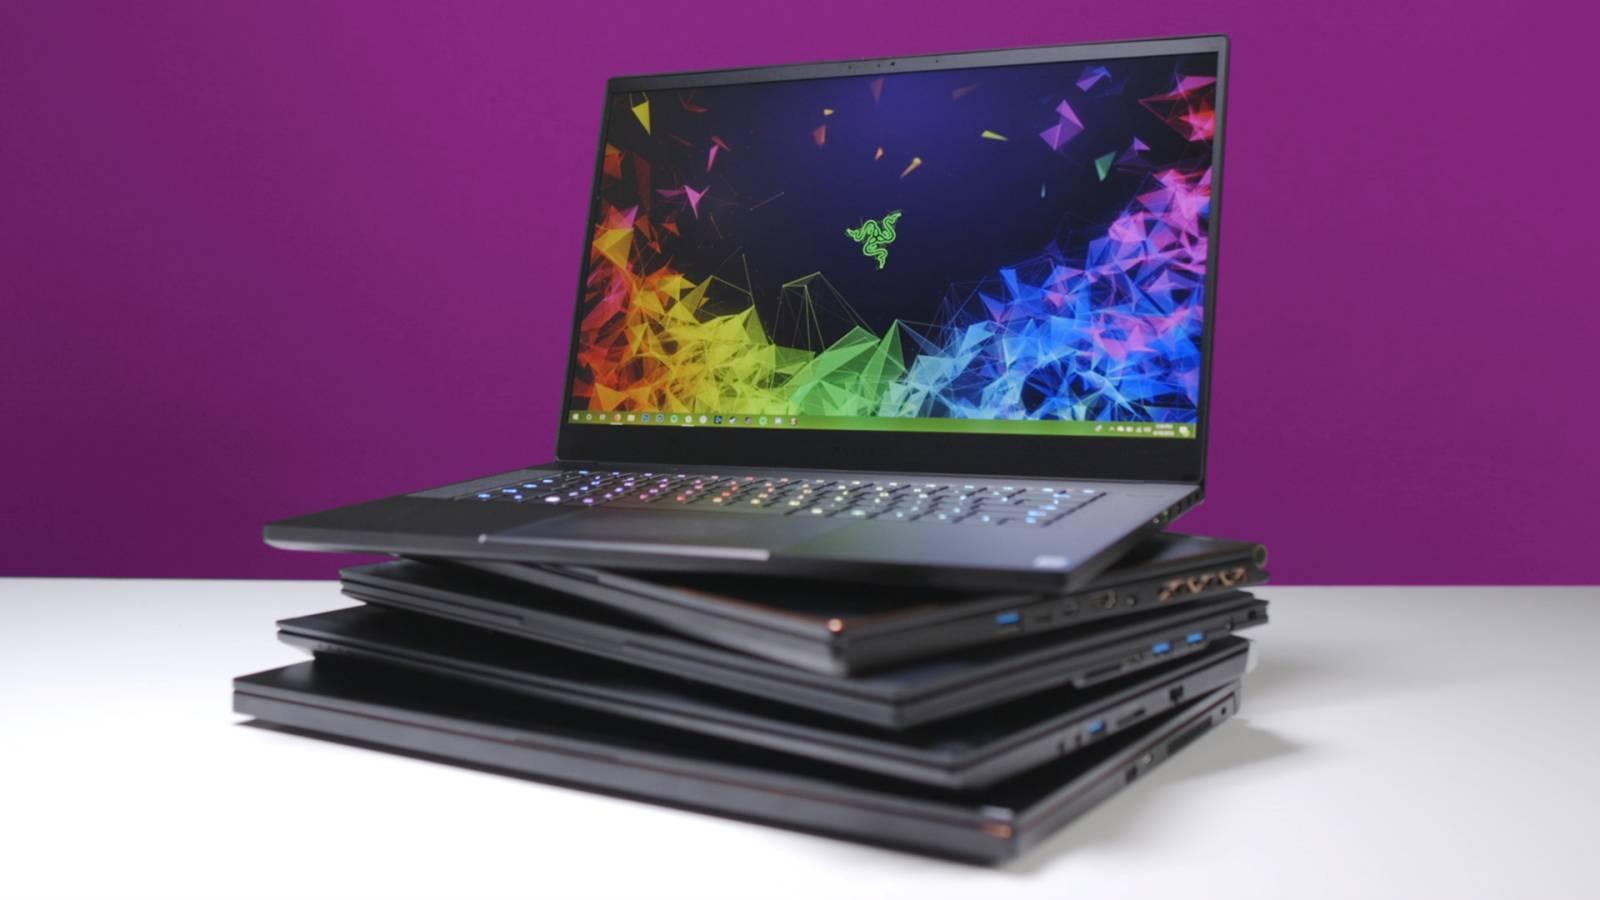 emag laptop reduceri 7000 lei